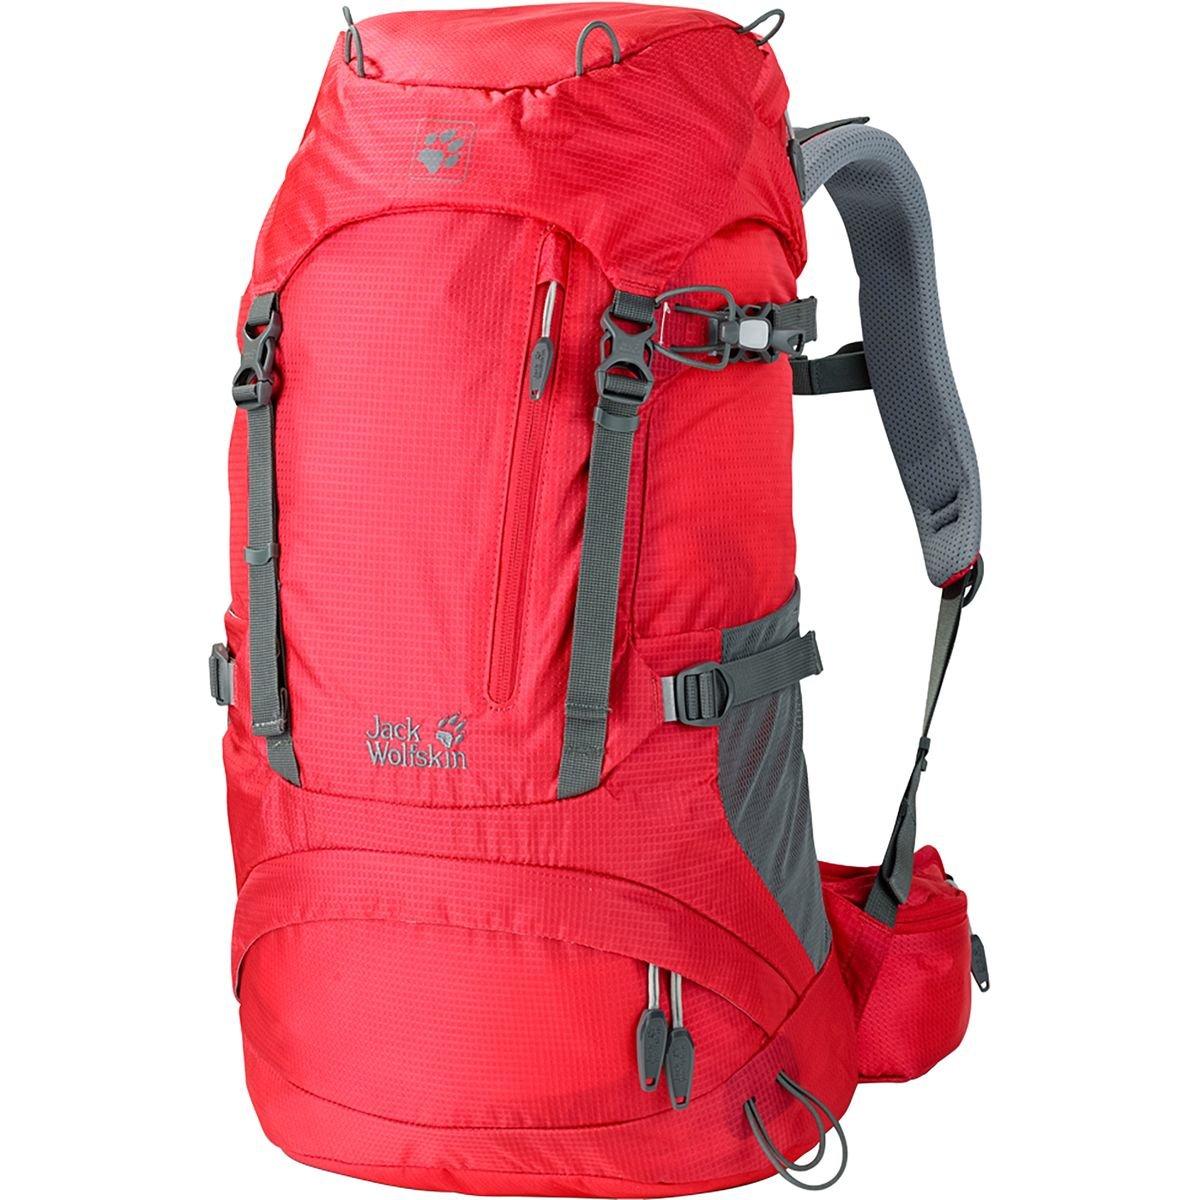 Jack Wolfskin Jack Wolfskin ACS Hike Pack 24 W Womens 24l Backpack